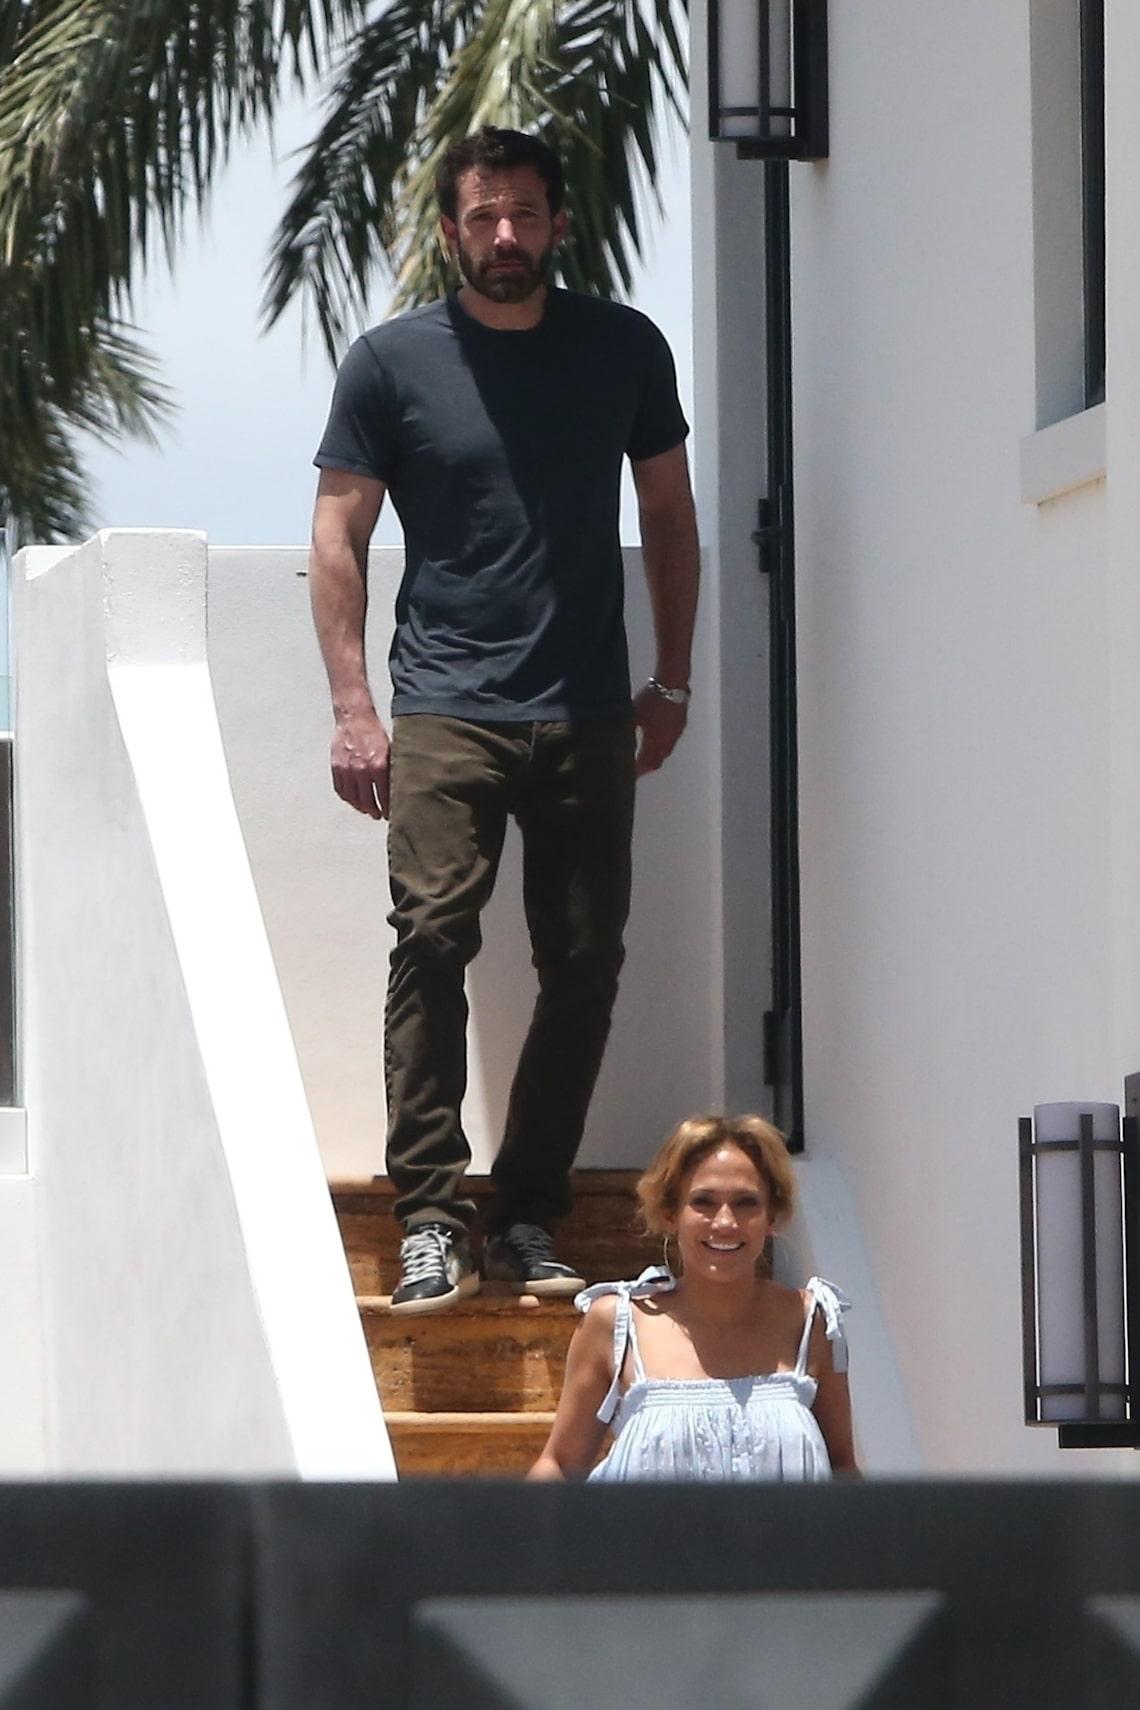 Bennifer 2.0 Is On! Jennifer Lopez & Ben Affleck Reunite in Miami